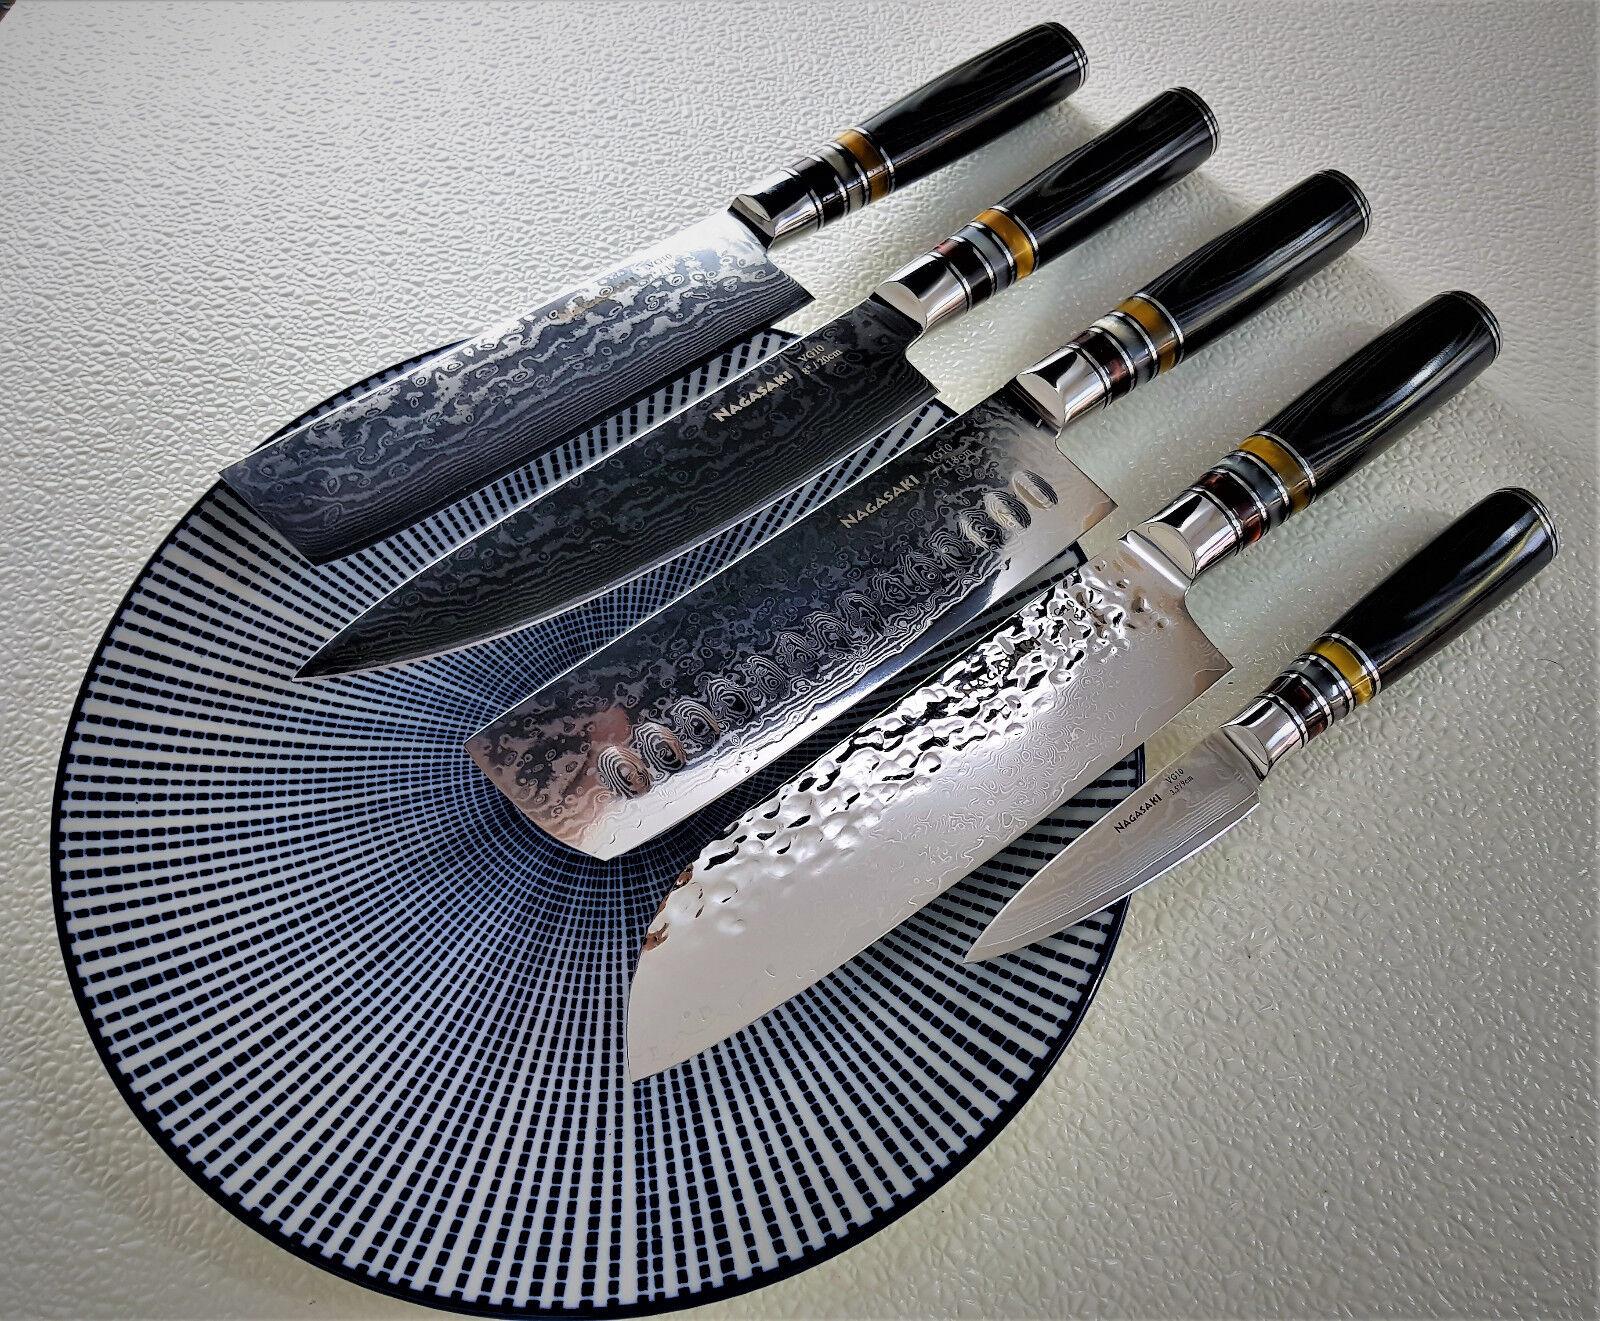 Nagasaki Damascus knife set, VG-10, couteau, cuisine couteau, couteau, cuisine, Damas,